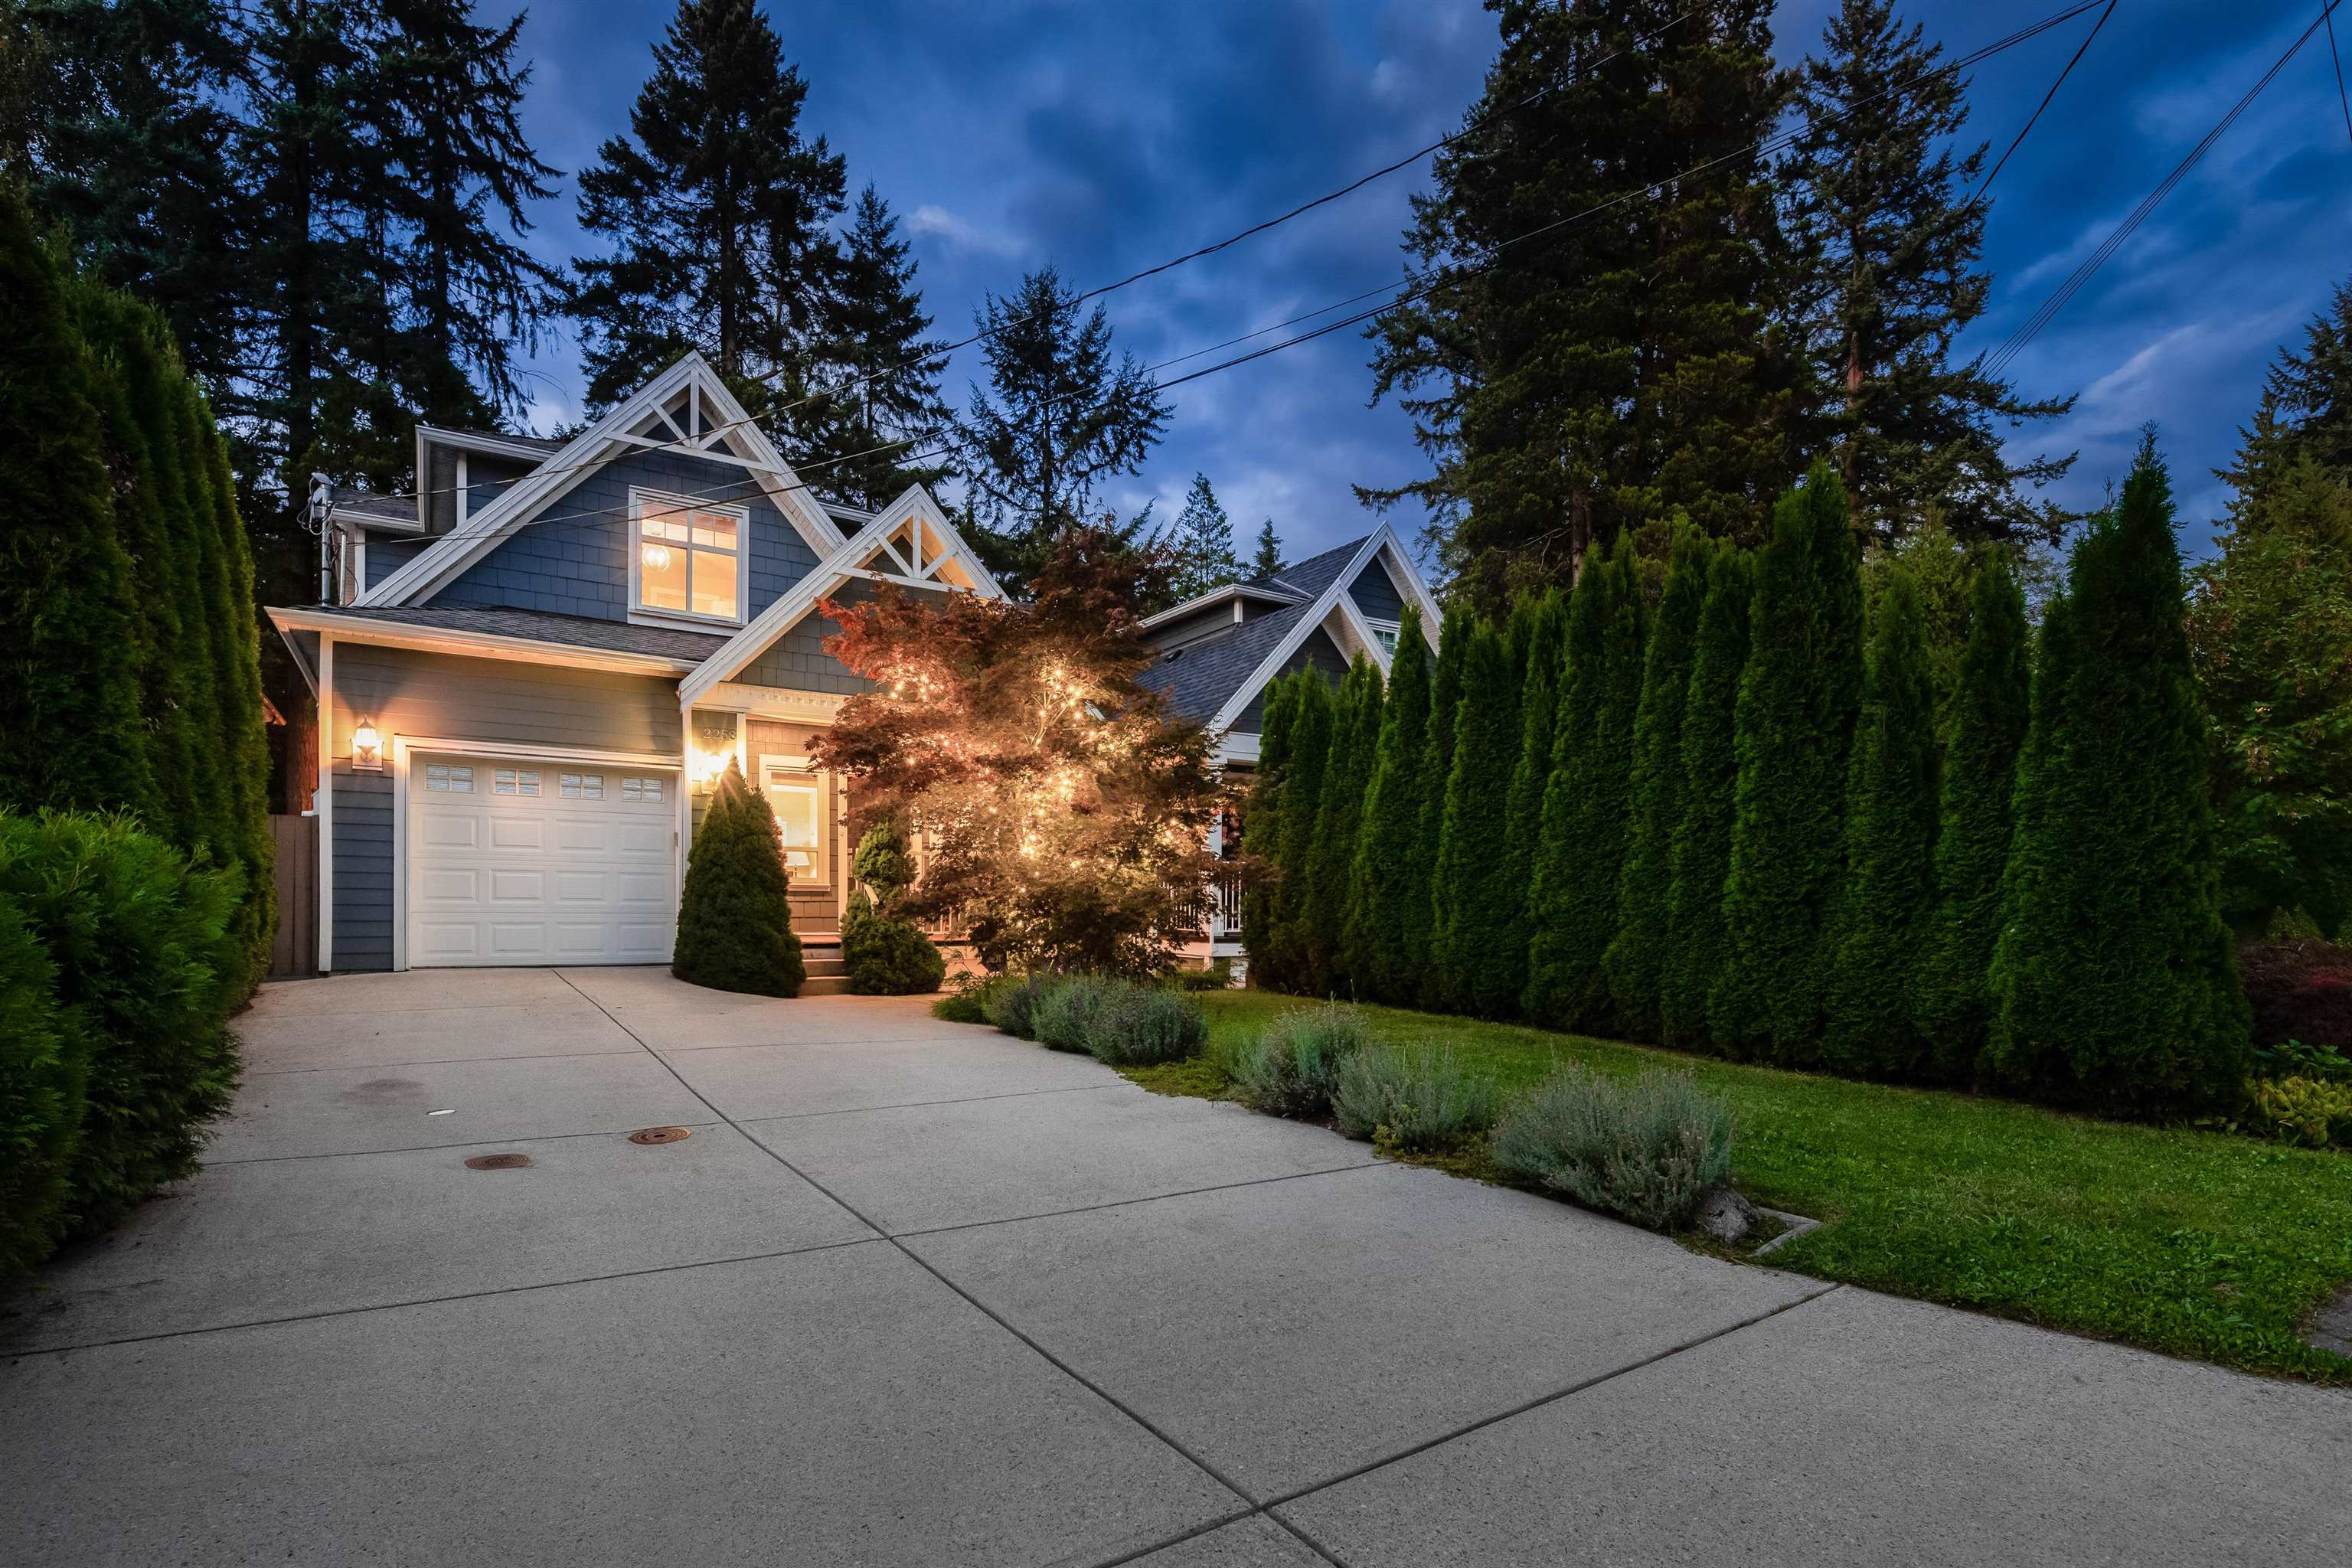 2258 WINDRIDGE DRIVE - Seymour NV House/Single Family for sale, 5 Bedrooms (R2617156) - #38